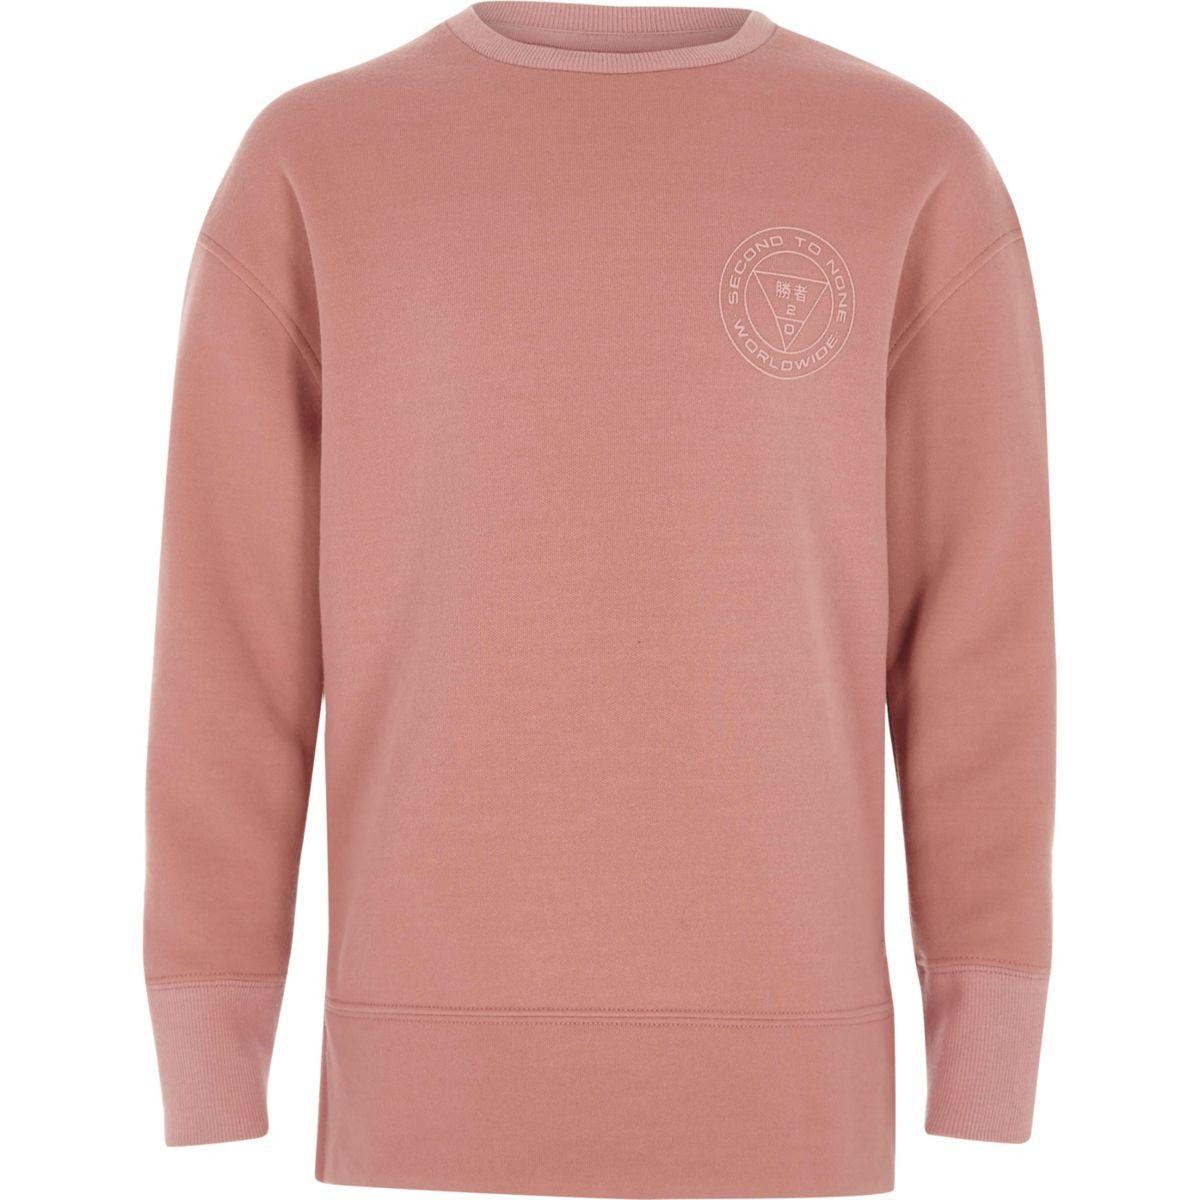 Boys pink 'second to none' sweatshirt